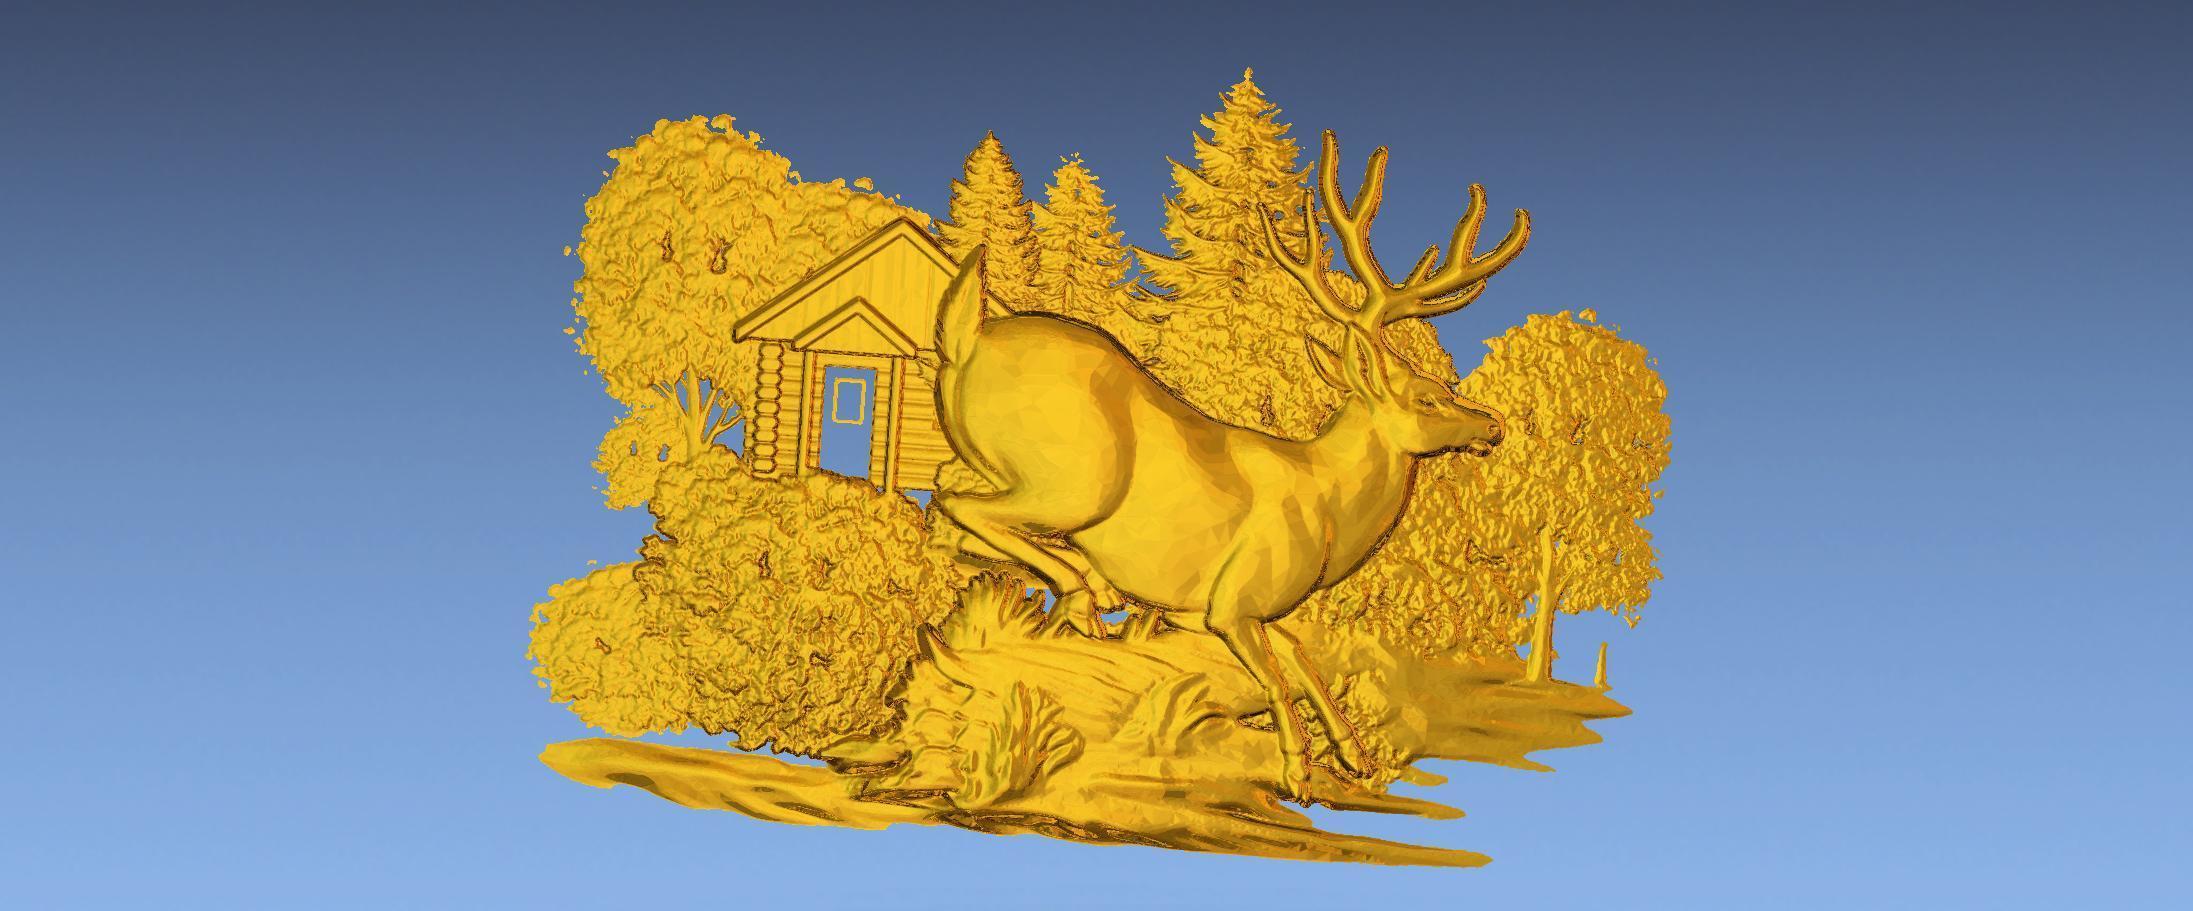 5.jpg Download free STL file 3D STL SCARED DEER • 3D print model, ALPHA_MENA